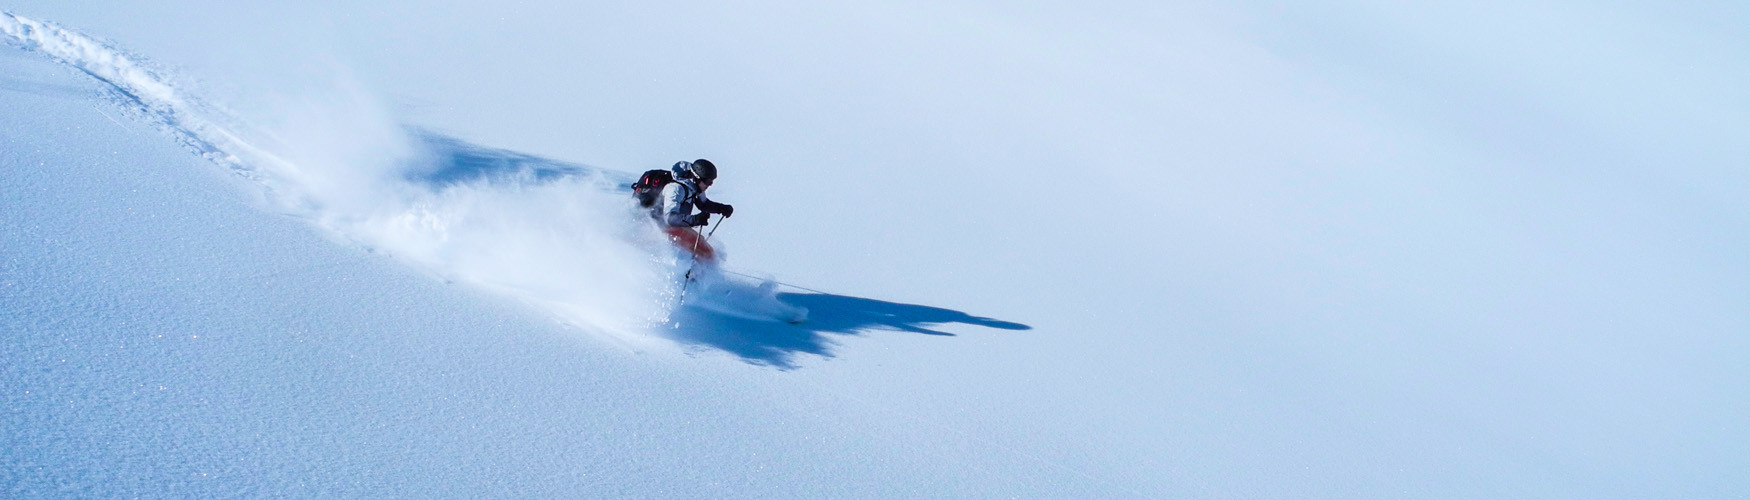 Ski und Skitourentraining